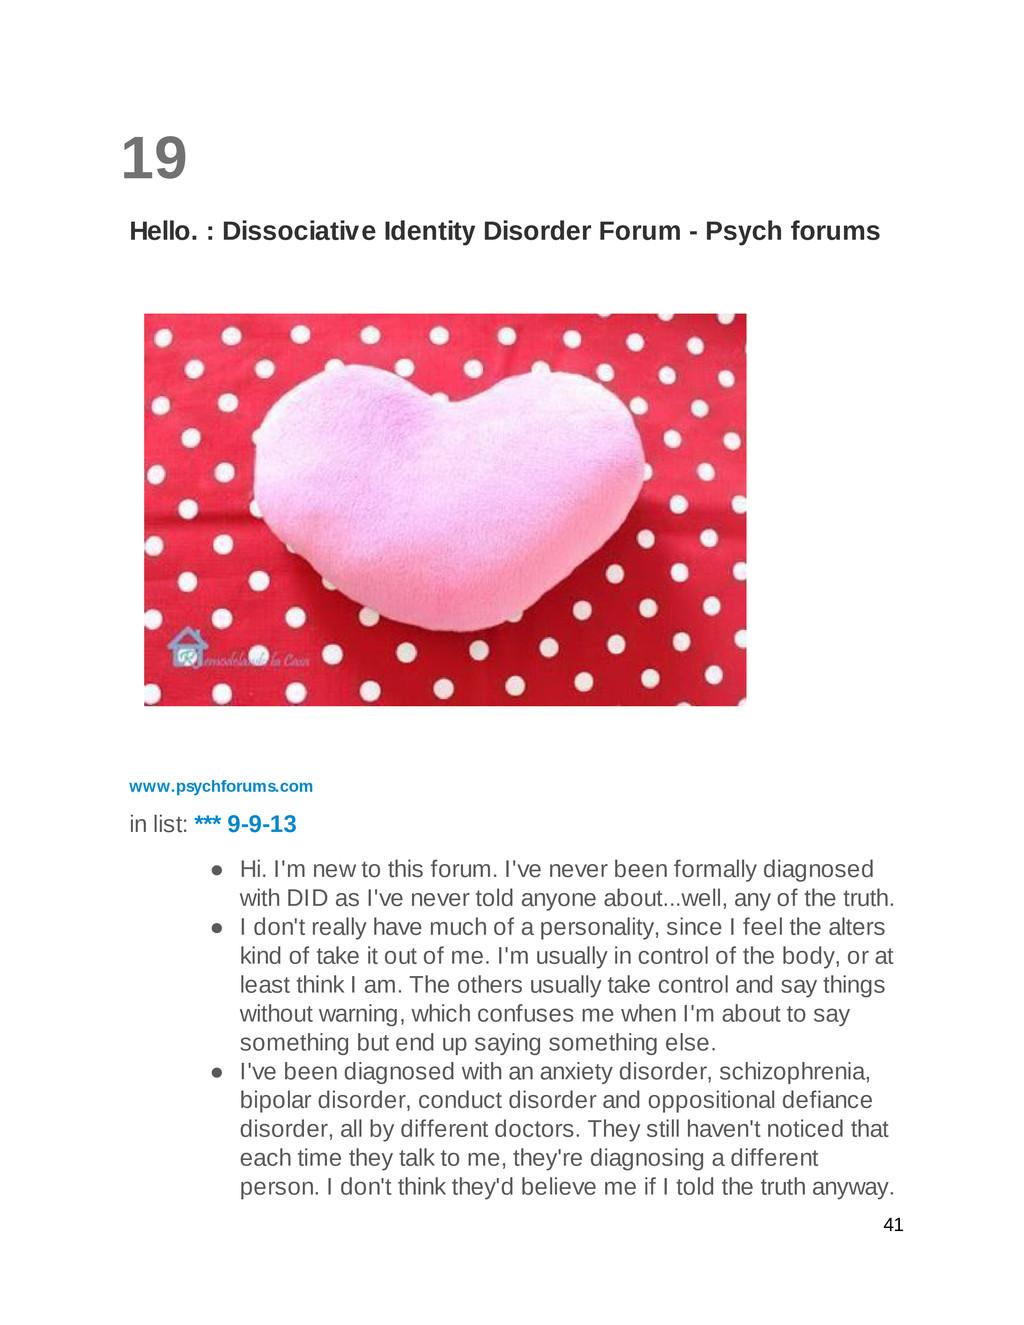 19 Hello. : Dissociative Identity Disorder Foru...